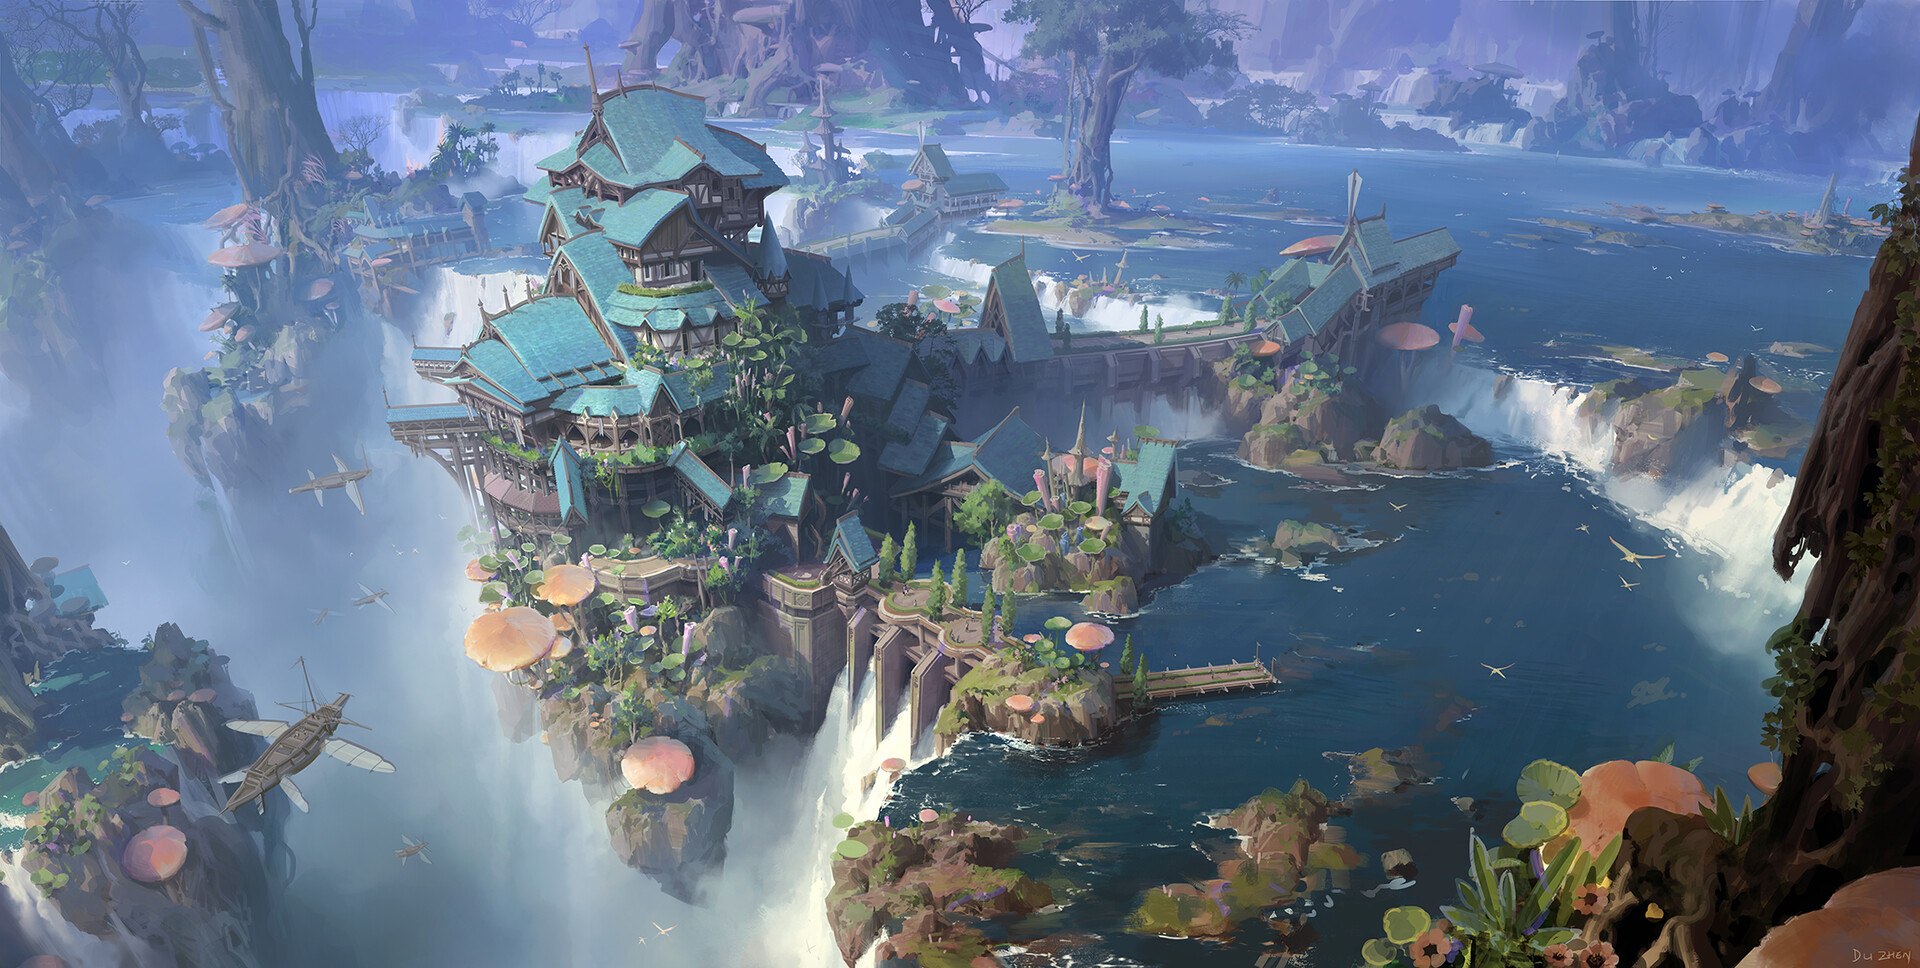 General 1920x968 cliff waterfall digital art ship fantasy art mushroom river city fantasy city fantasy architecture lok du